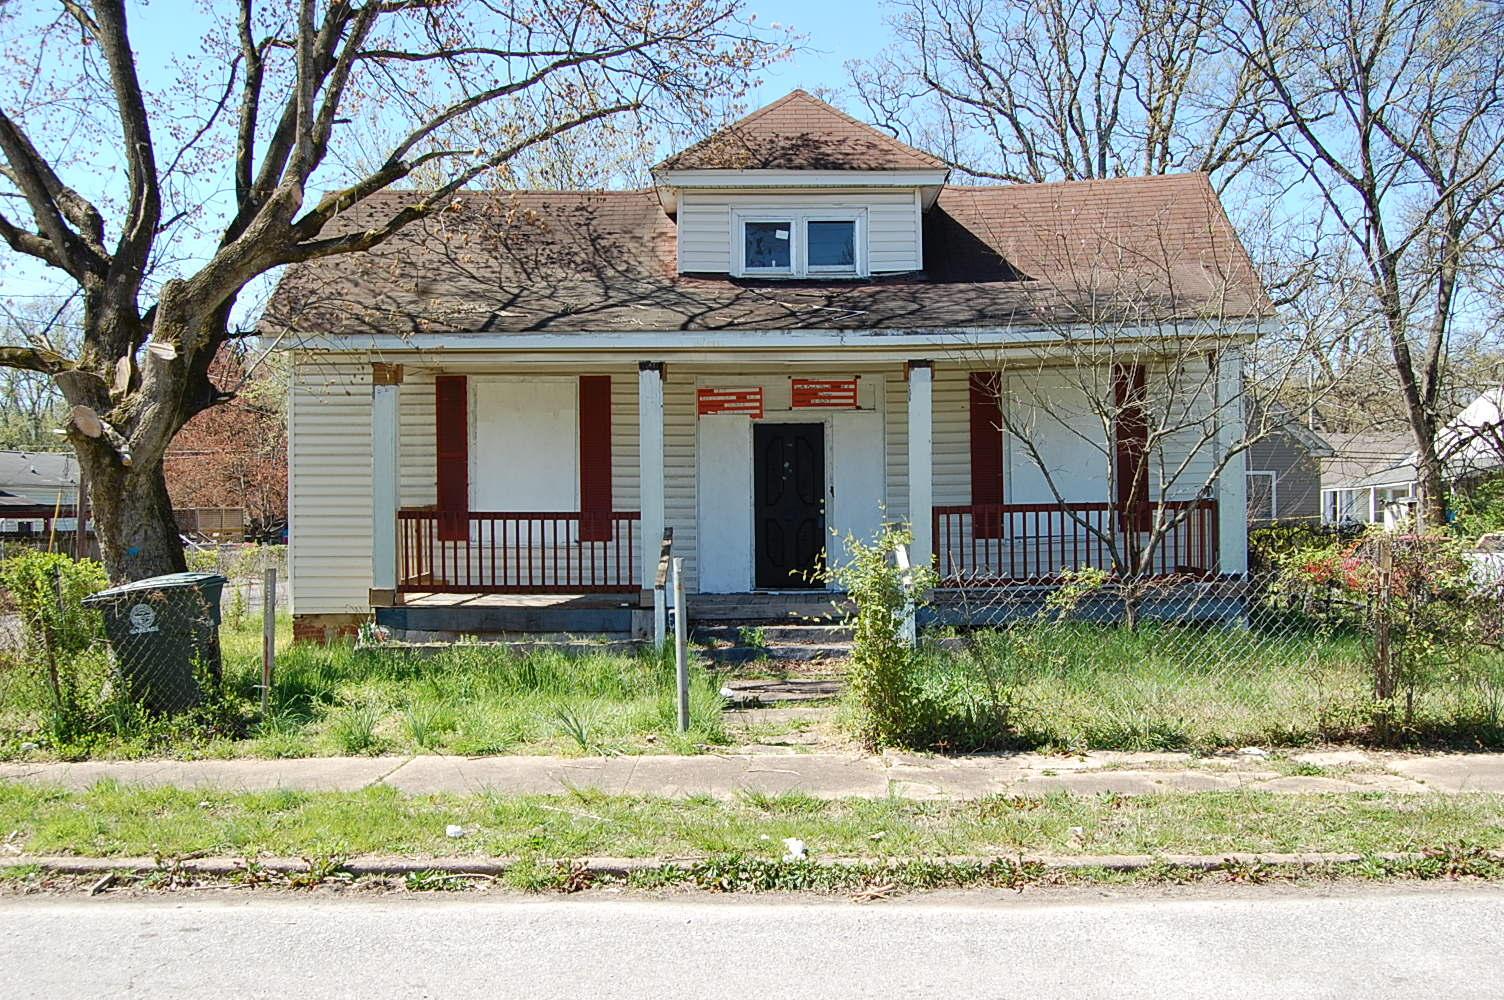 1815 S Beech St, Chattanooga, TN 37404